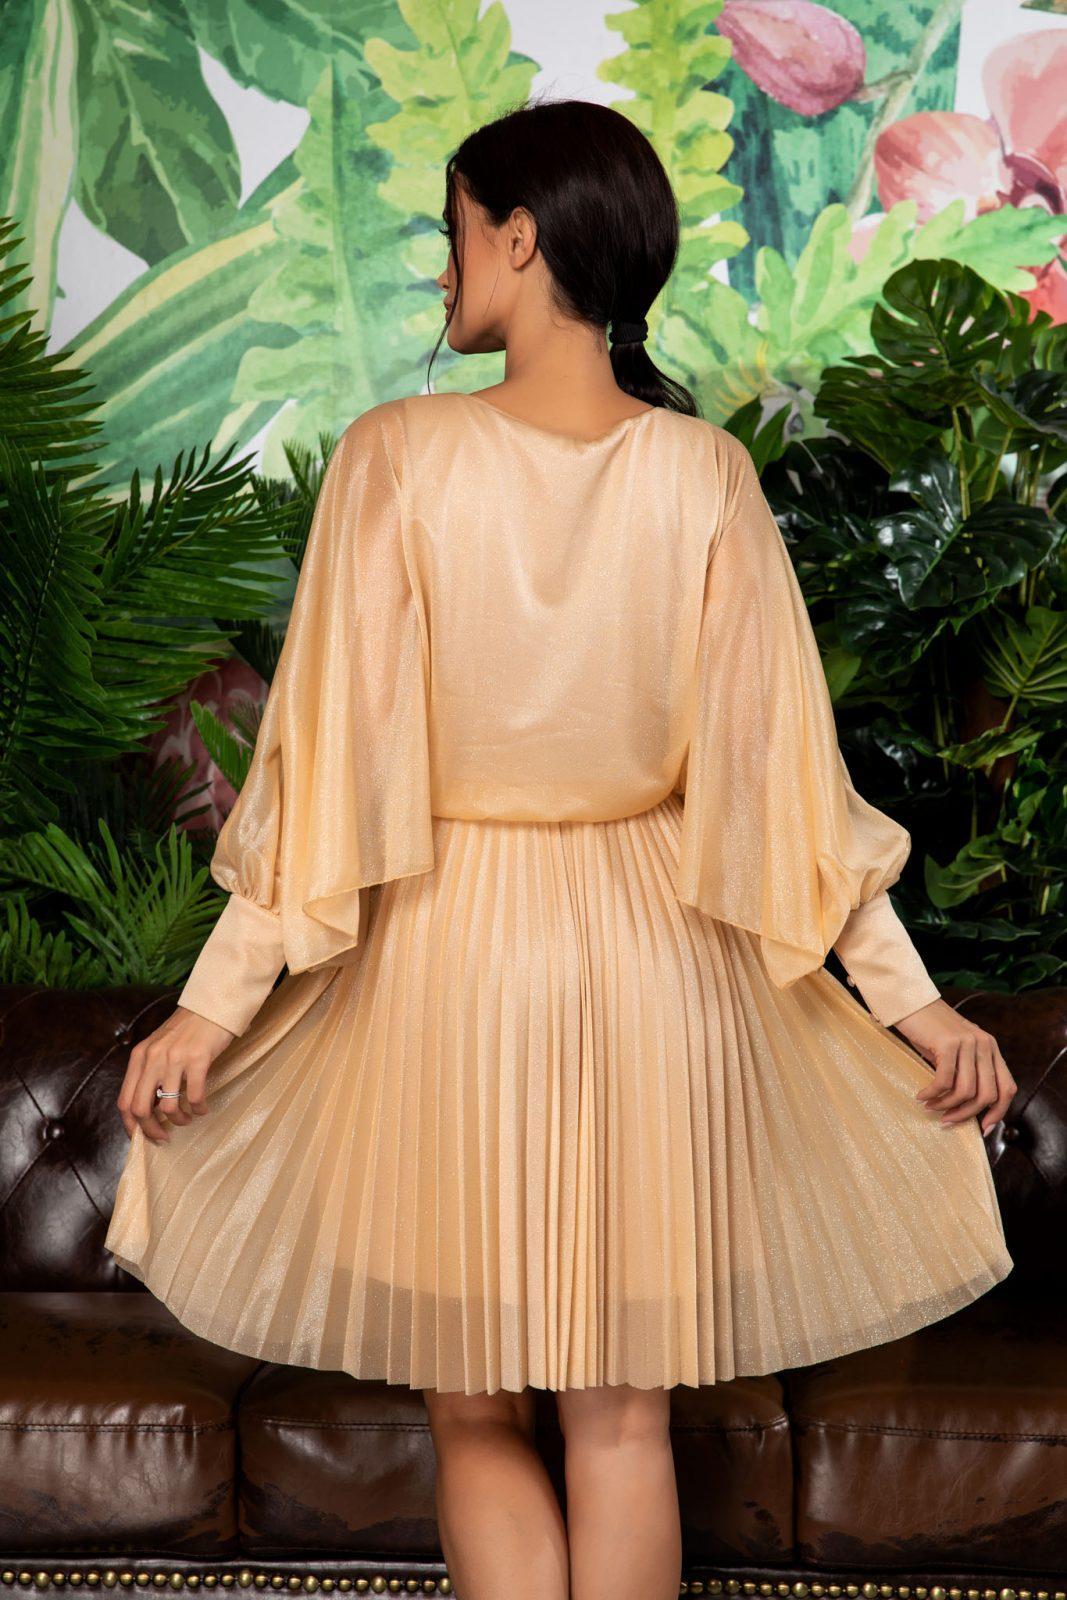 Nude Πλισέ Βραδινό Φόρεμα Analisa 7872